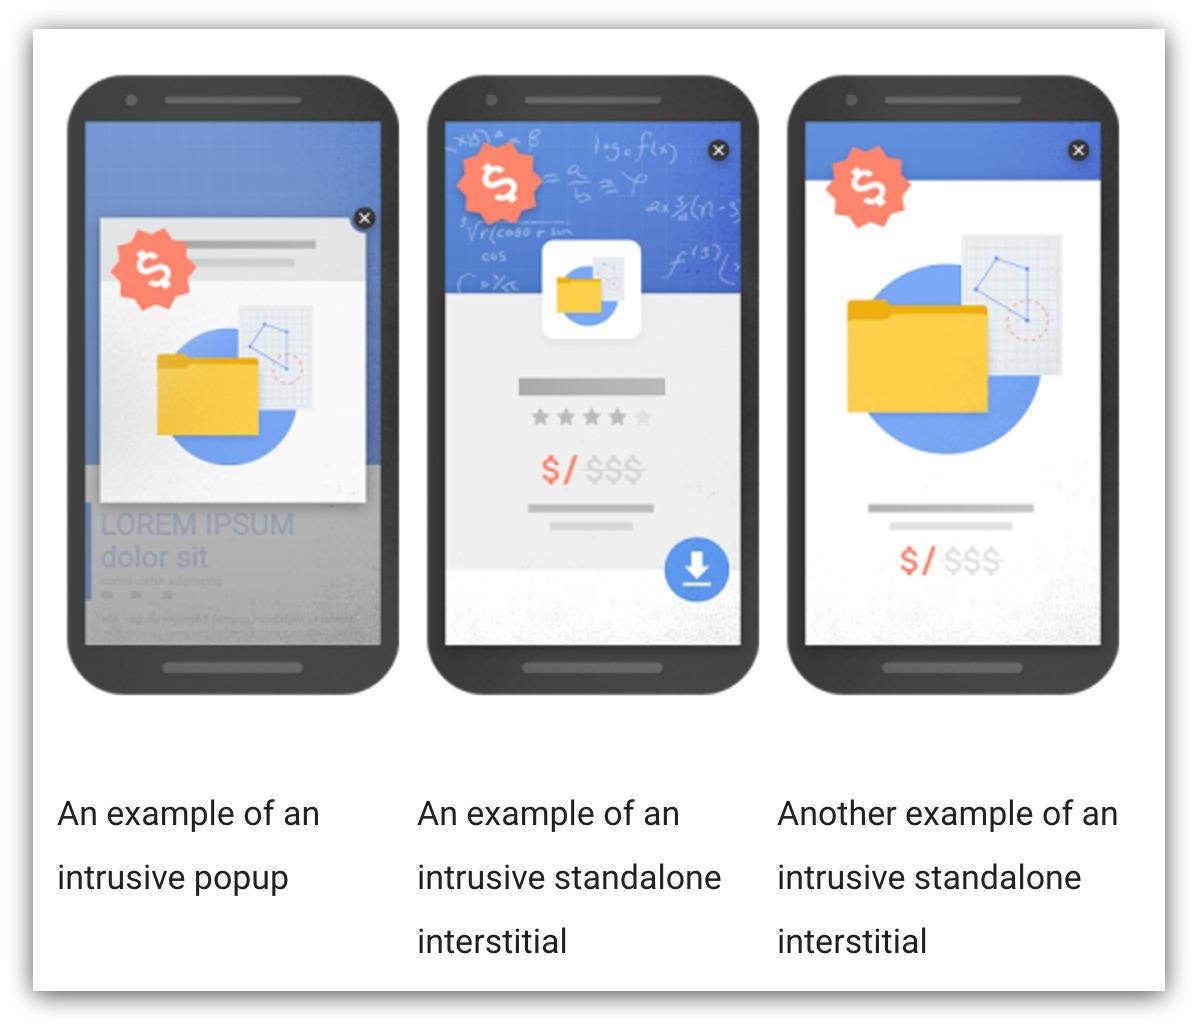 Google mobile unaccepted popups